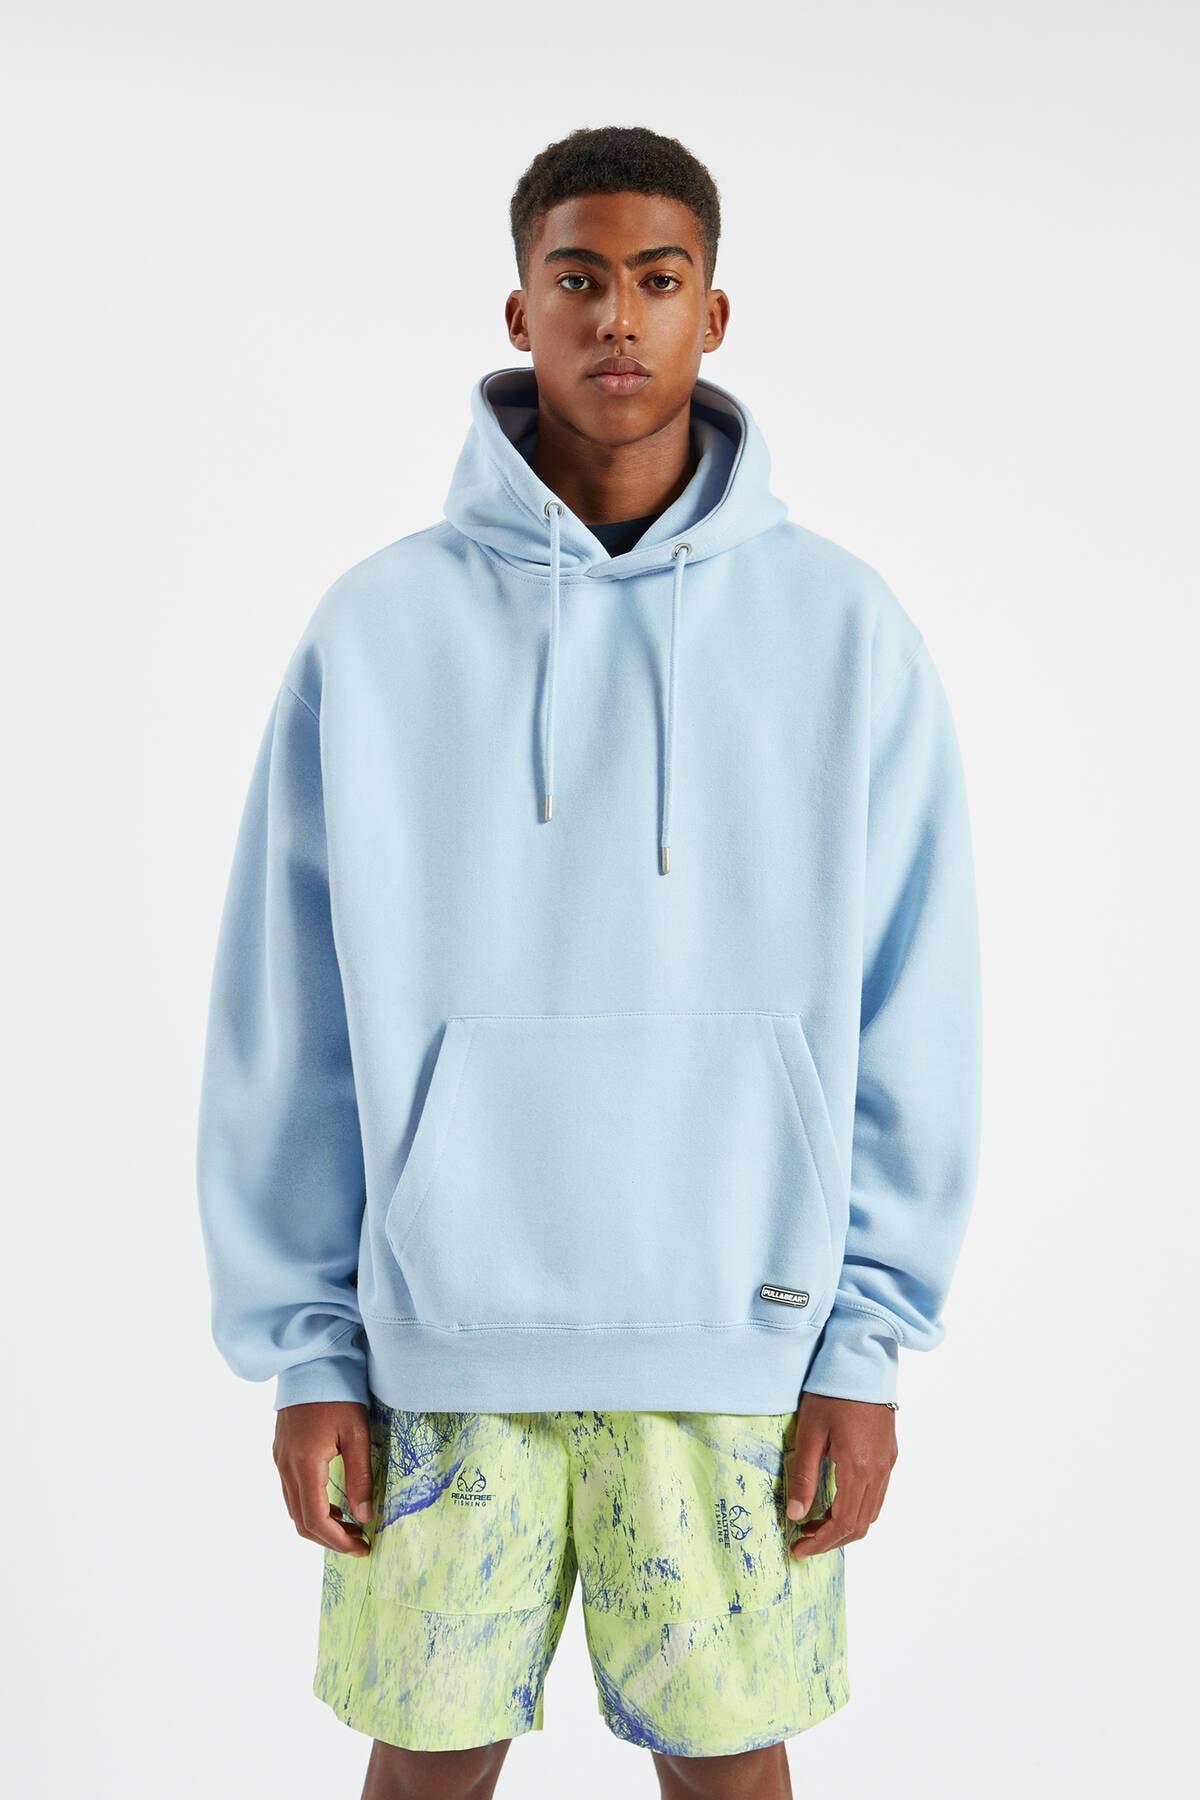 Pull & Bear Erkek Gök Mavisi Kapüşonlu Kanguru Cepli Basic Sweatshirt 09594513